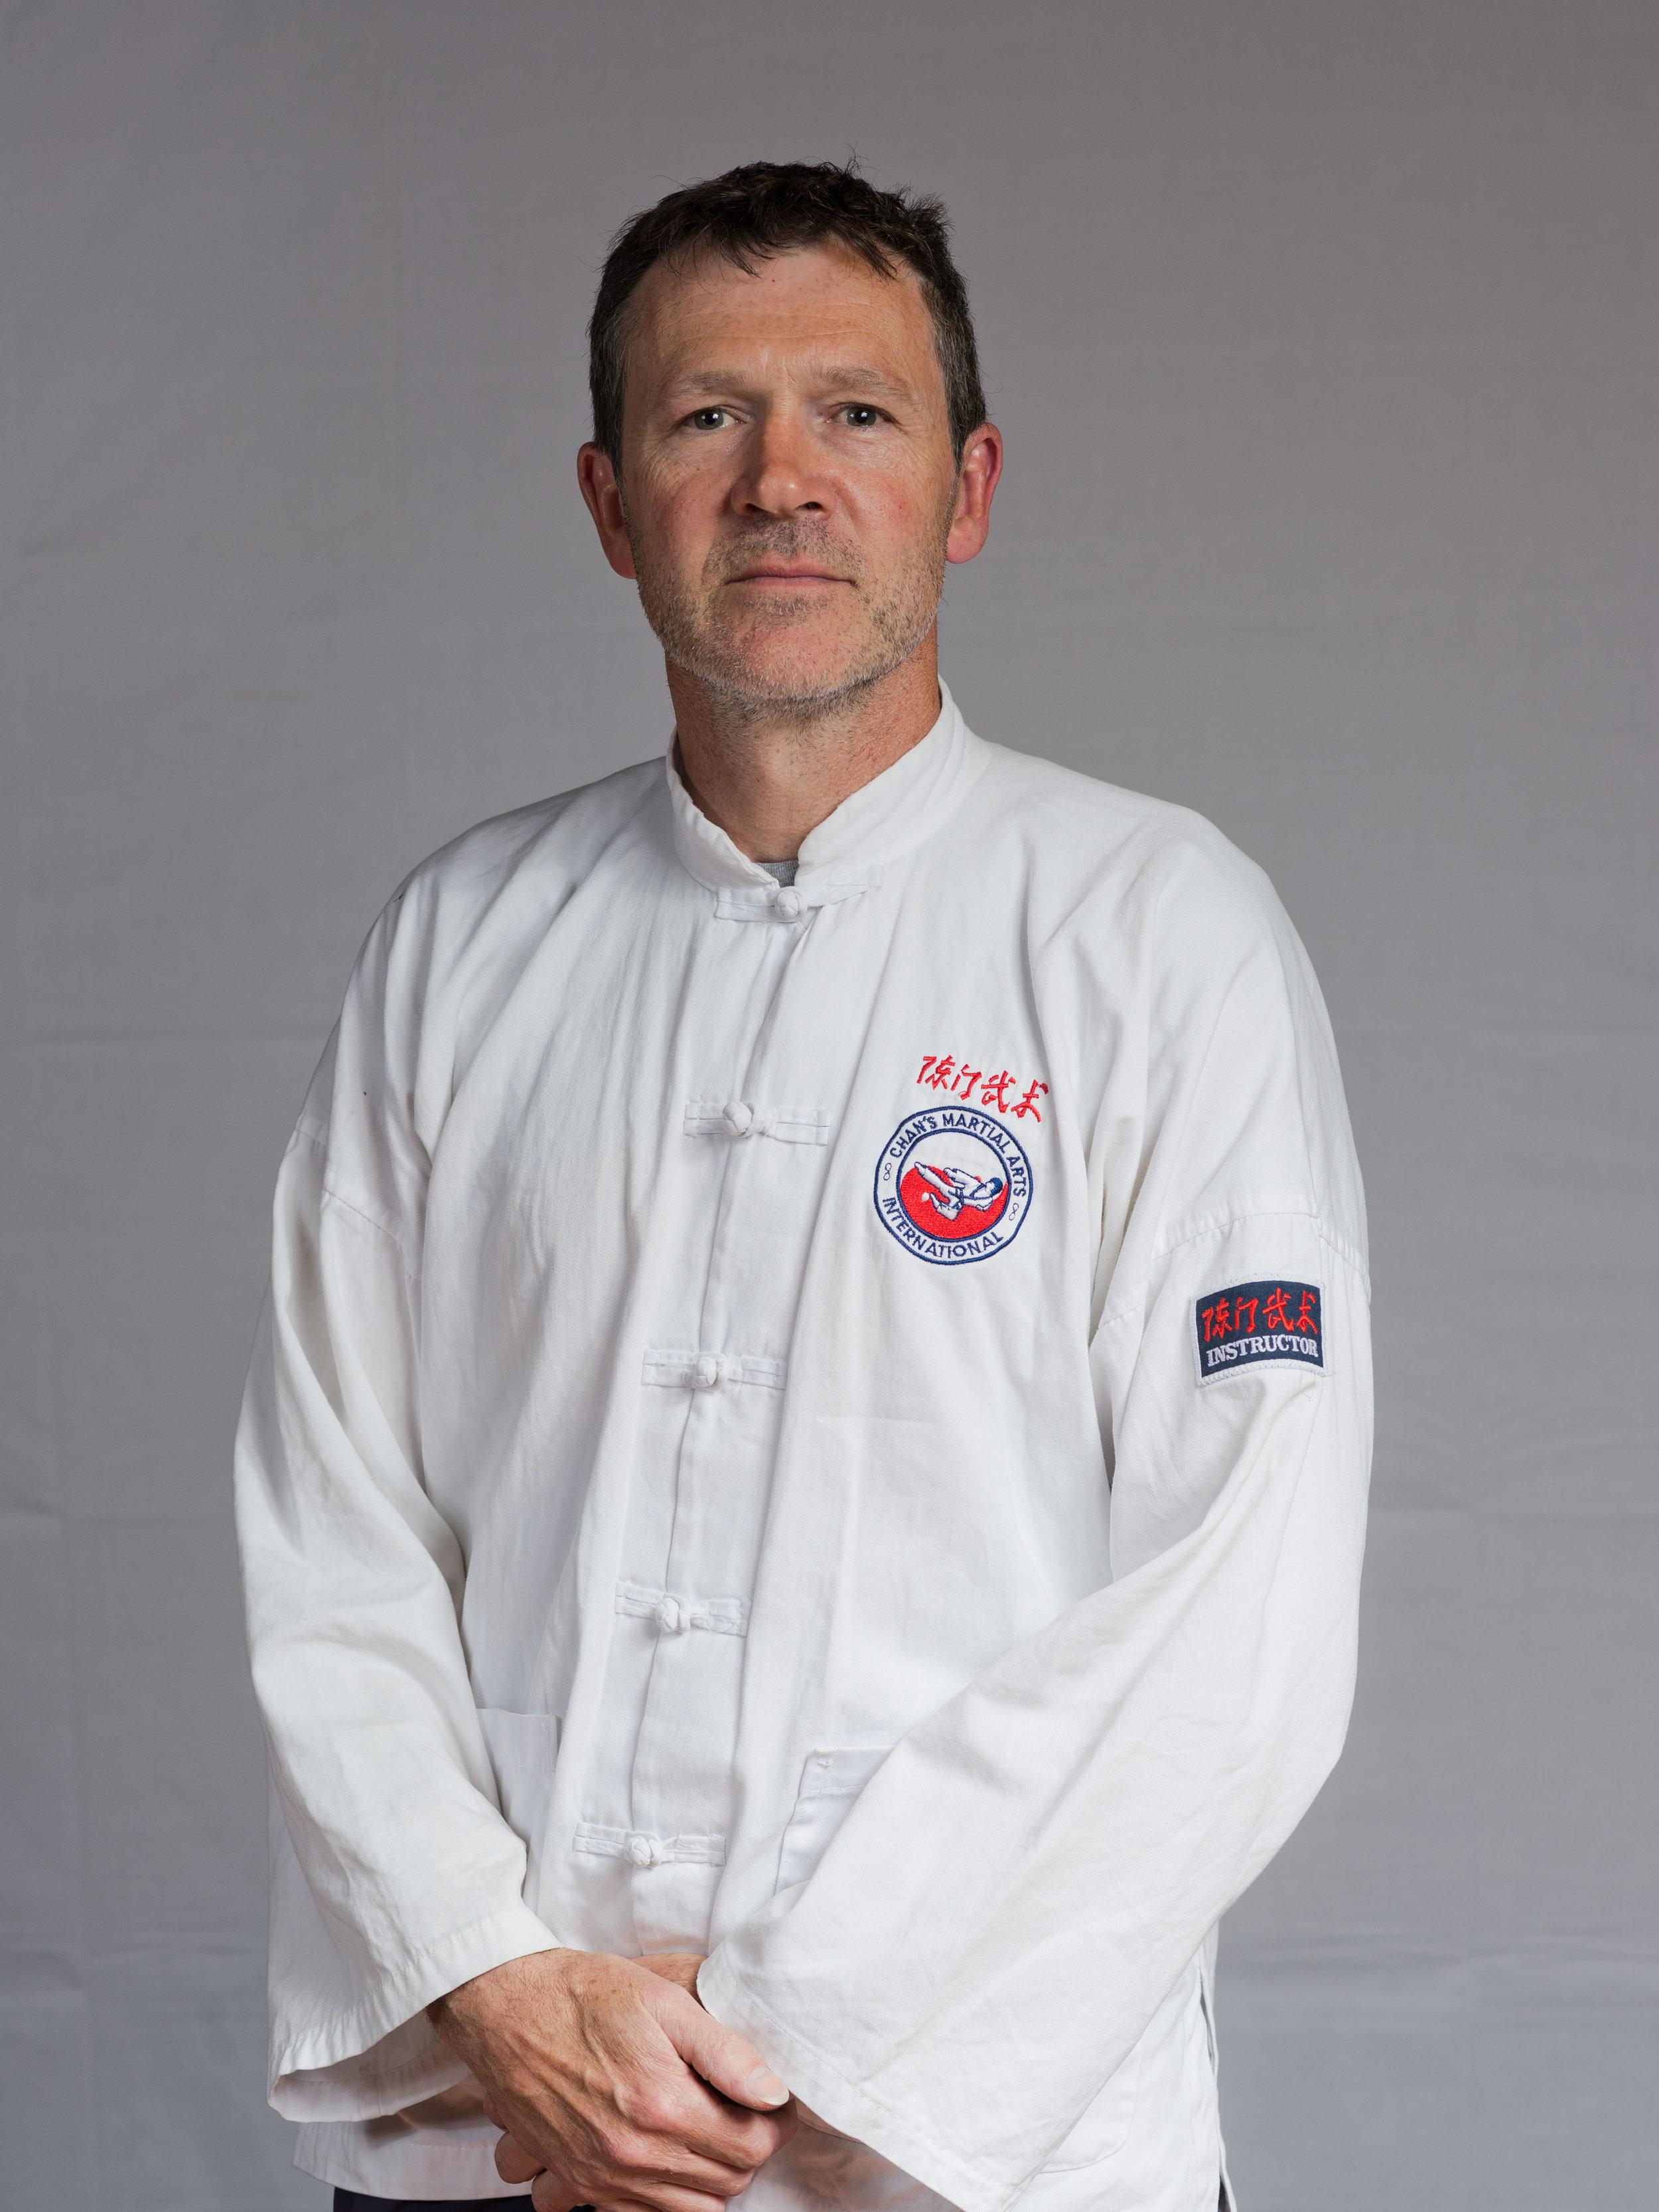 Senior Instructor - Mr Chris Allen